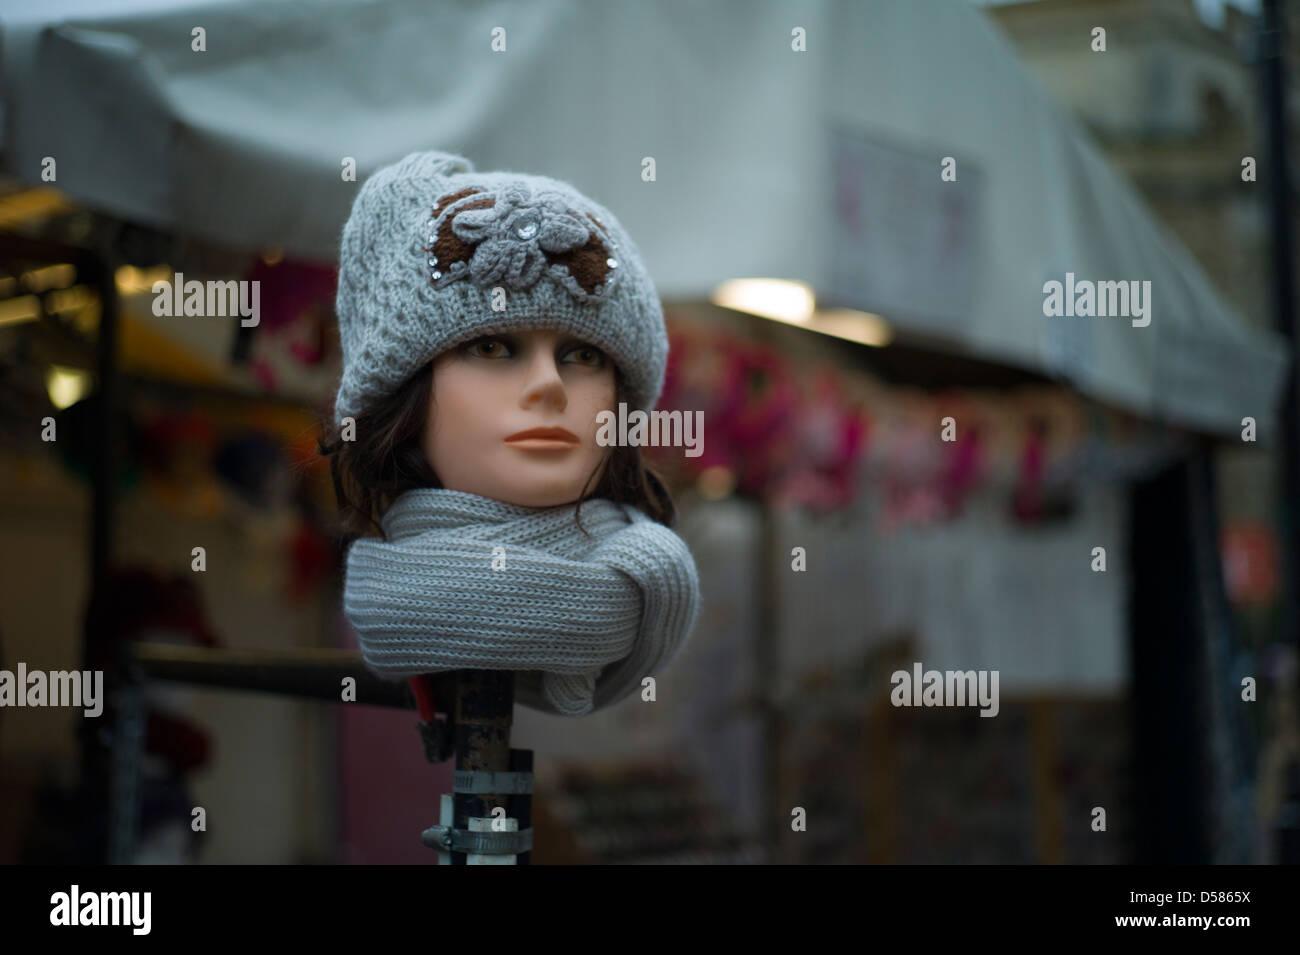 Cambridge Street Photography,Cambridge,England,January 2013. Cambridge Market, model head displays headwear. - Stock Image